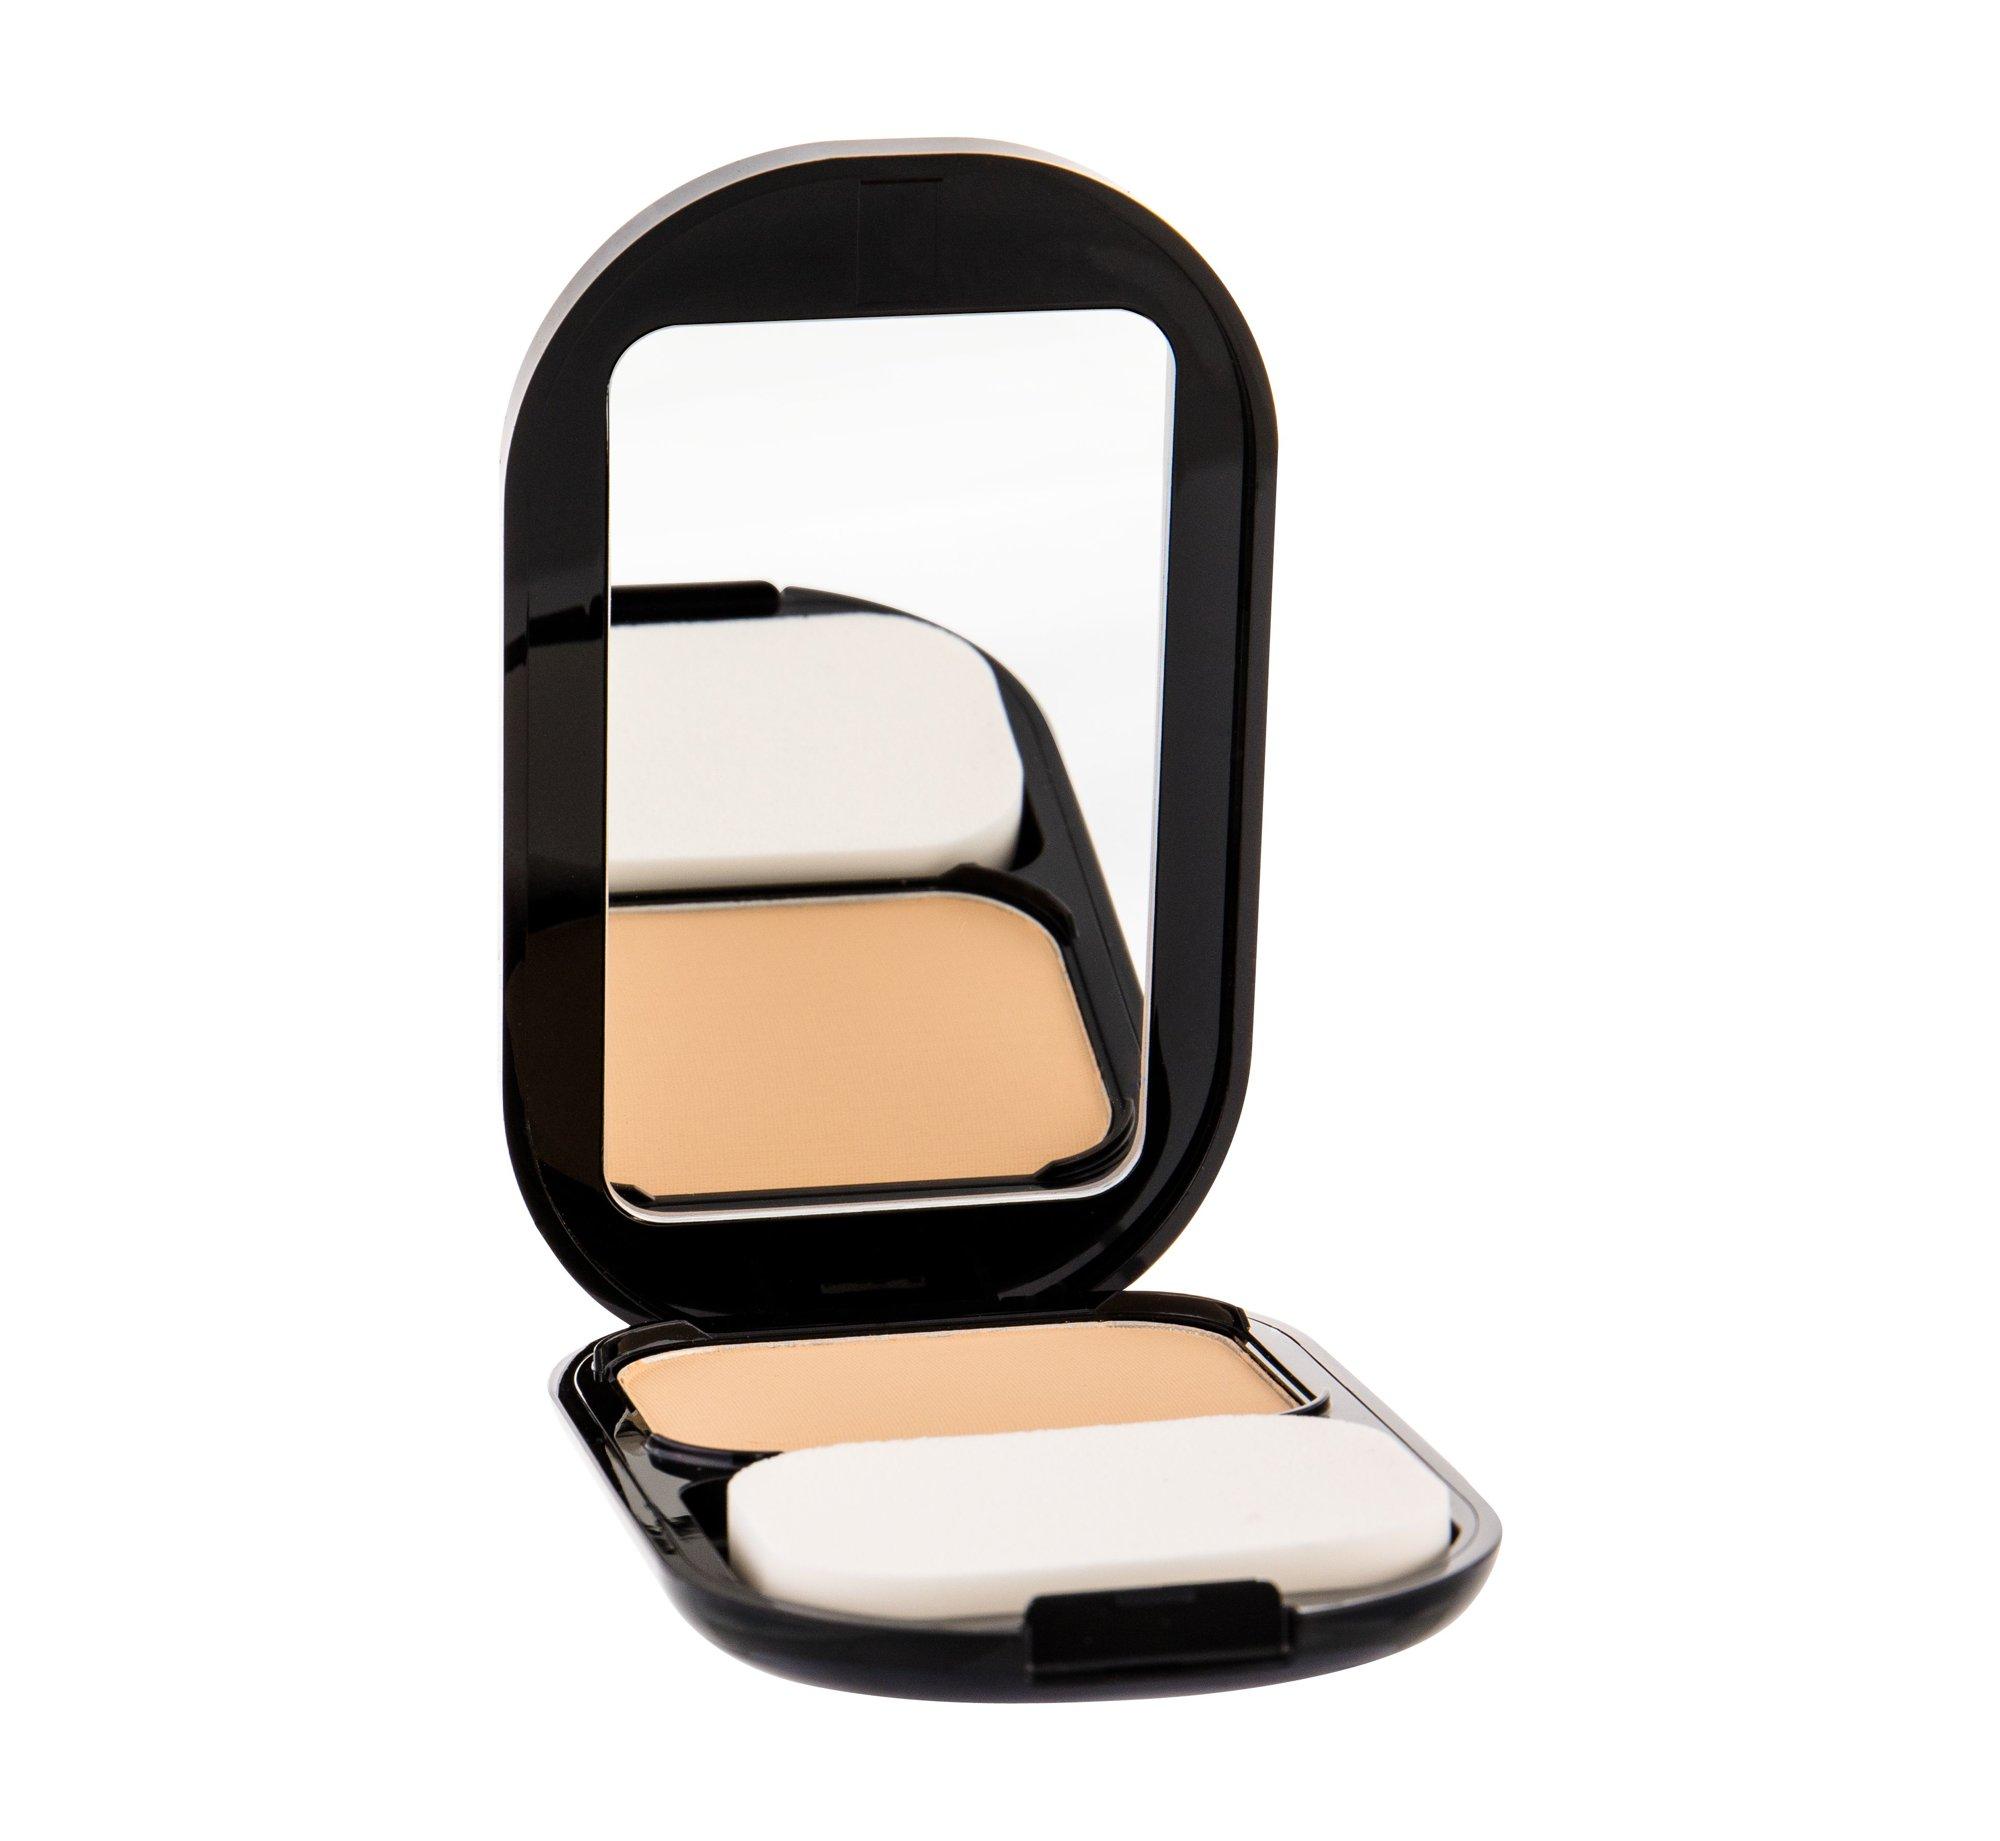 Max Factor Facefinity Makeup 10ml 001 Porcelain